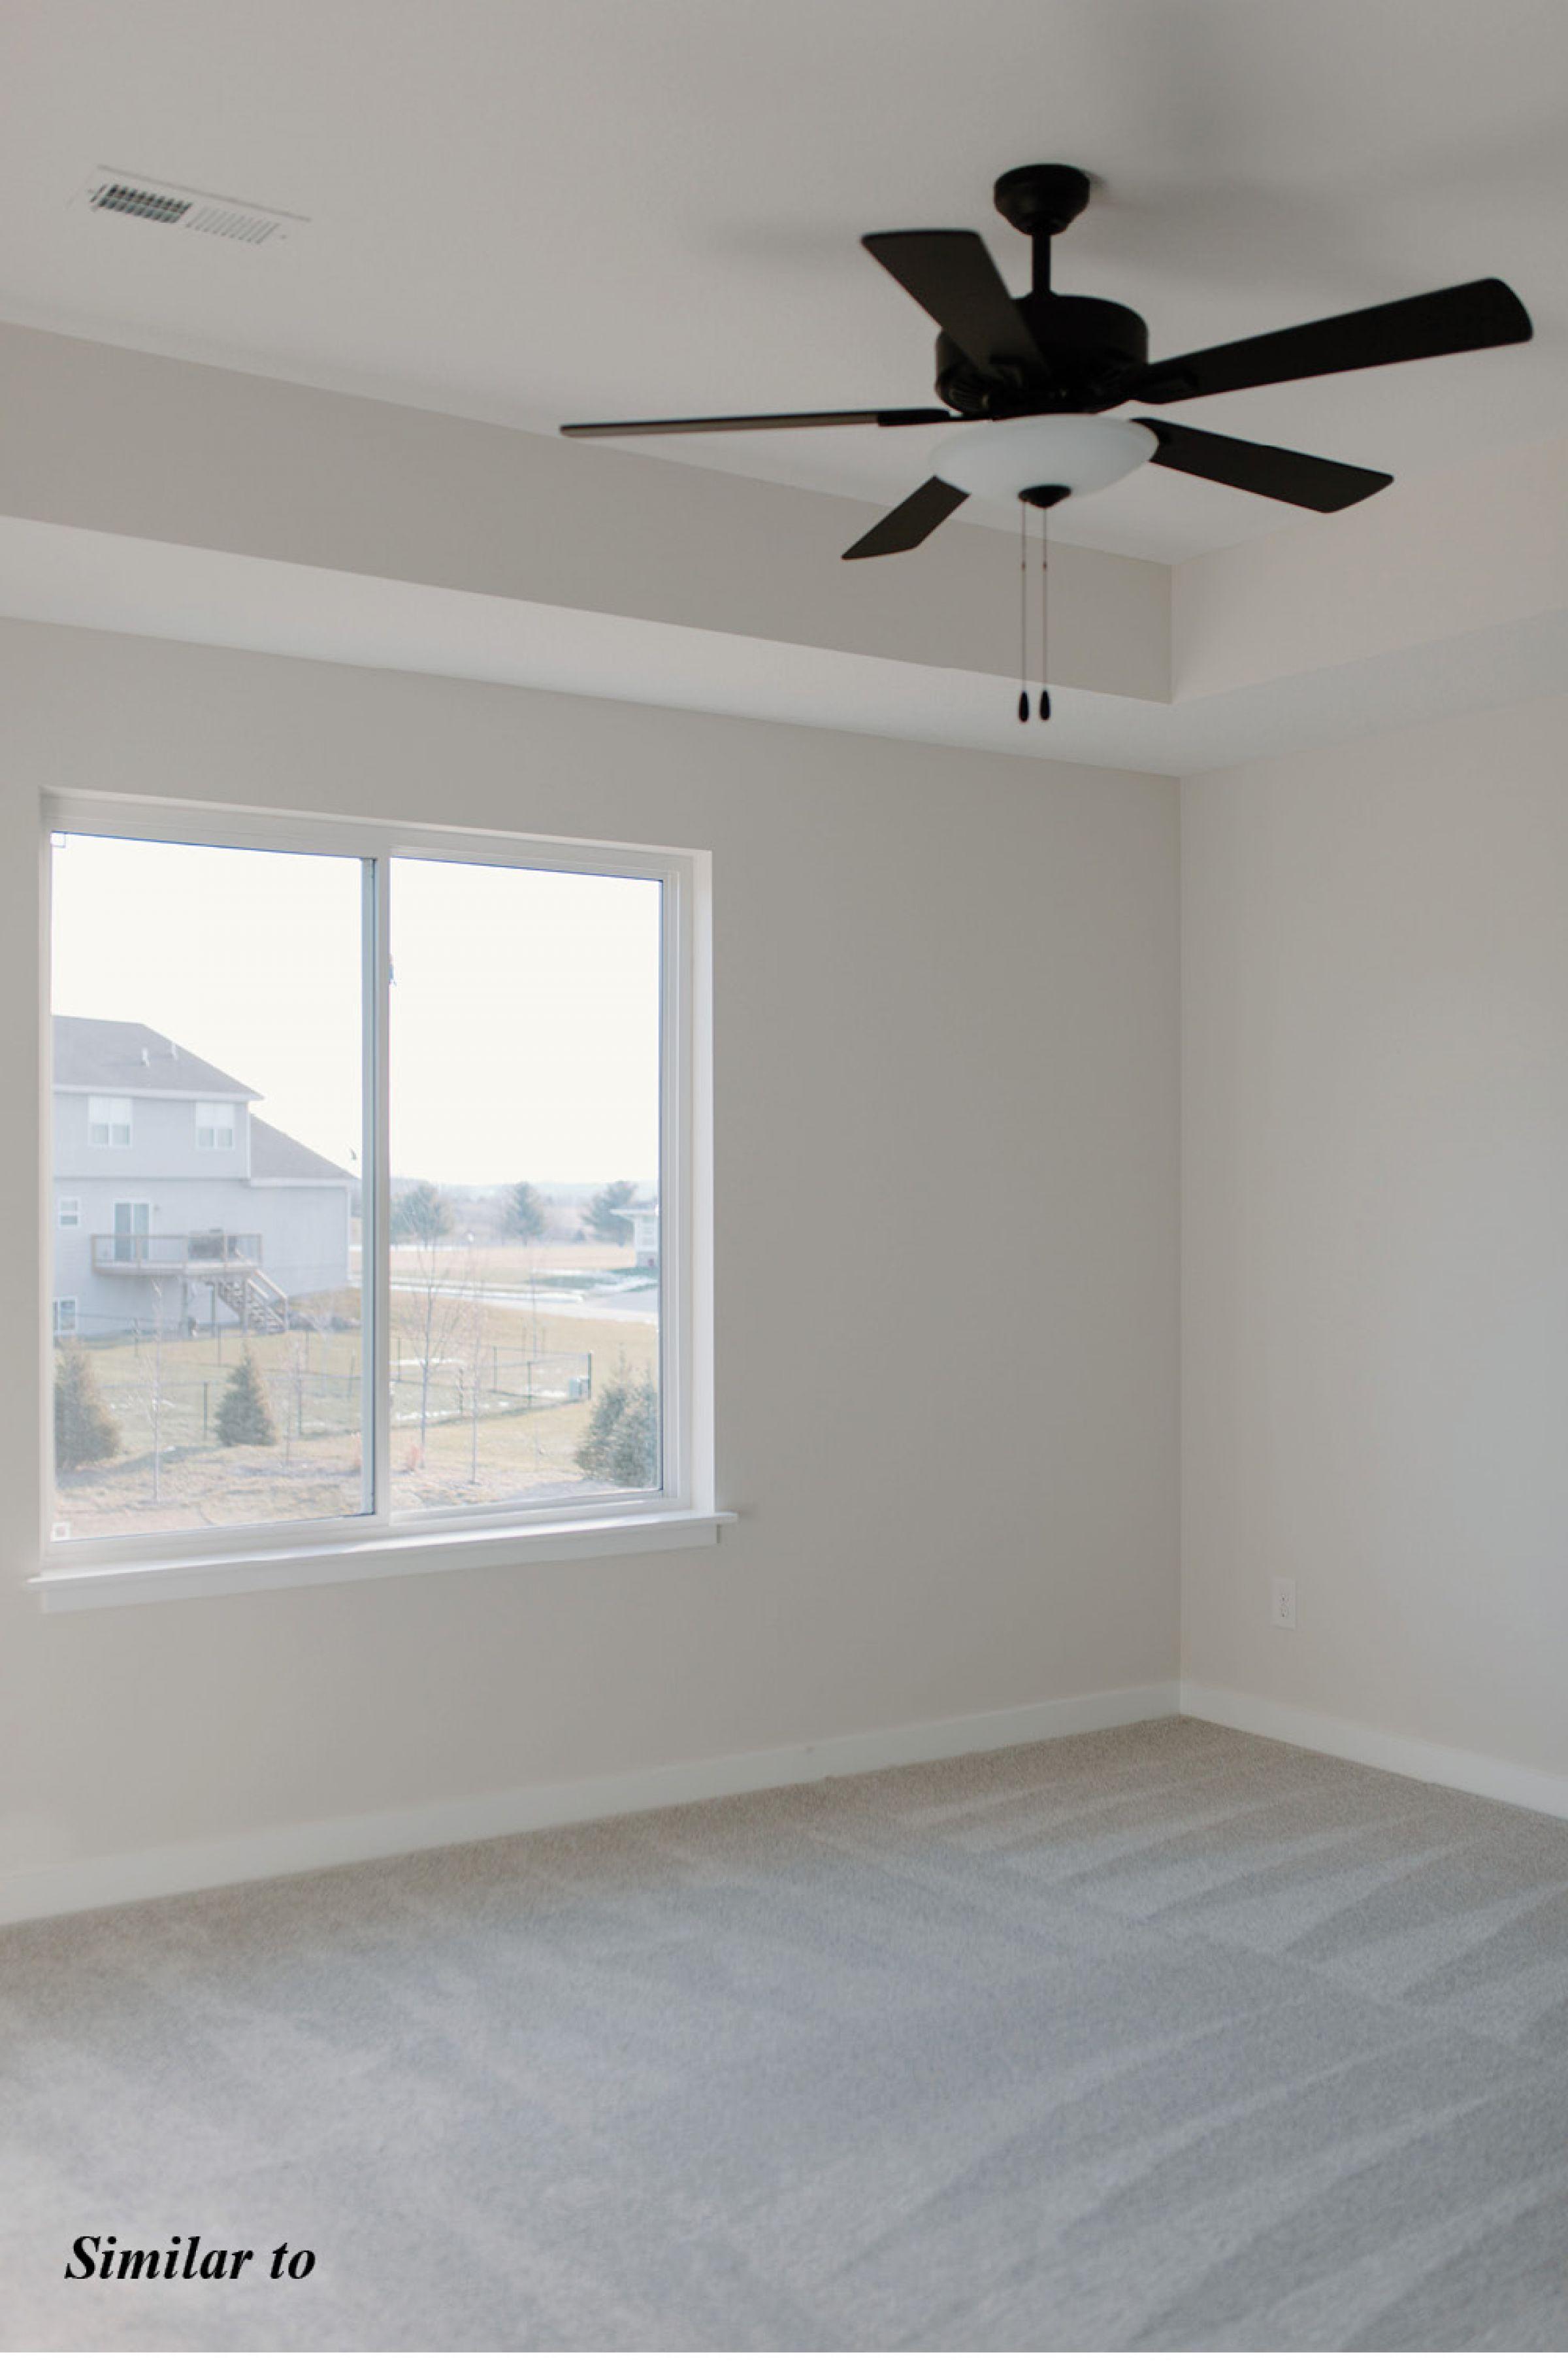 residential-warren-county-iowa-0-acres-listing-number-15677-10-2021-08-06-160511.jpg